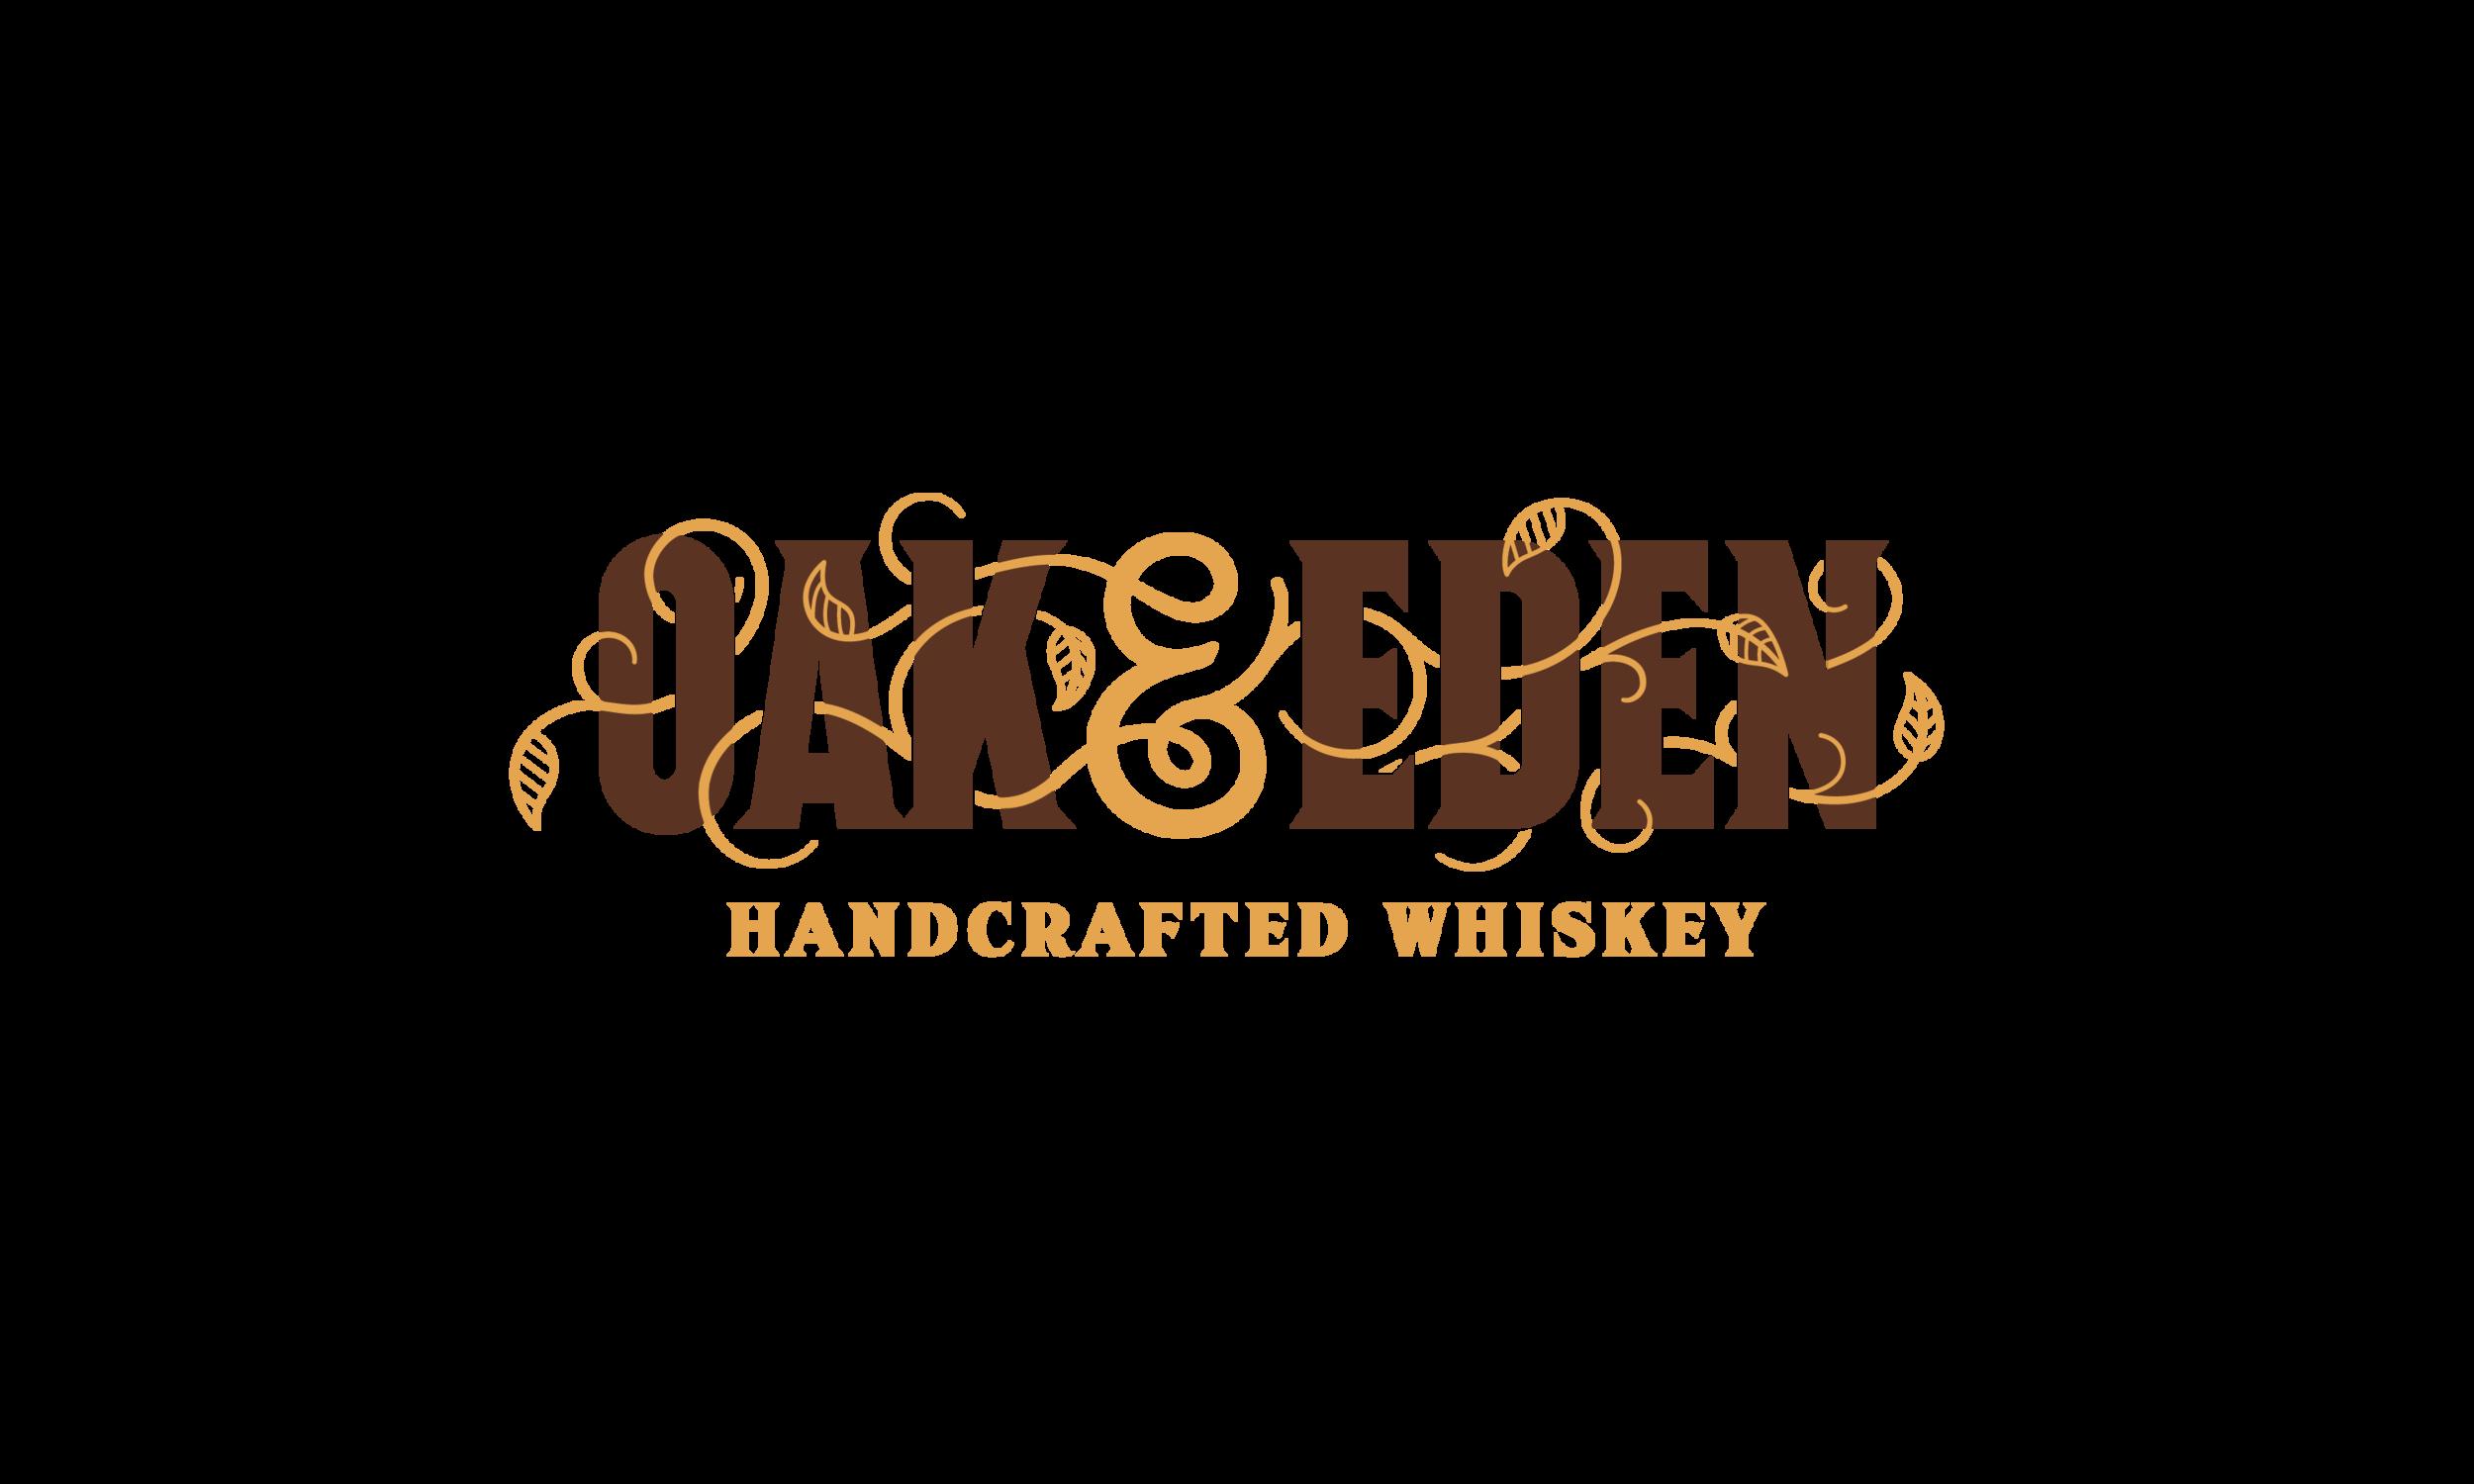 WDCo-Logos-Oak&Eden.png